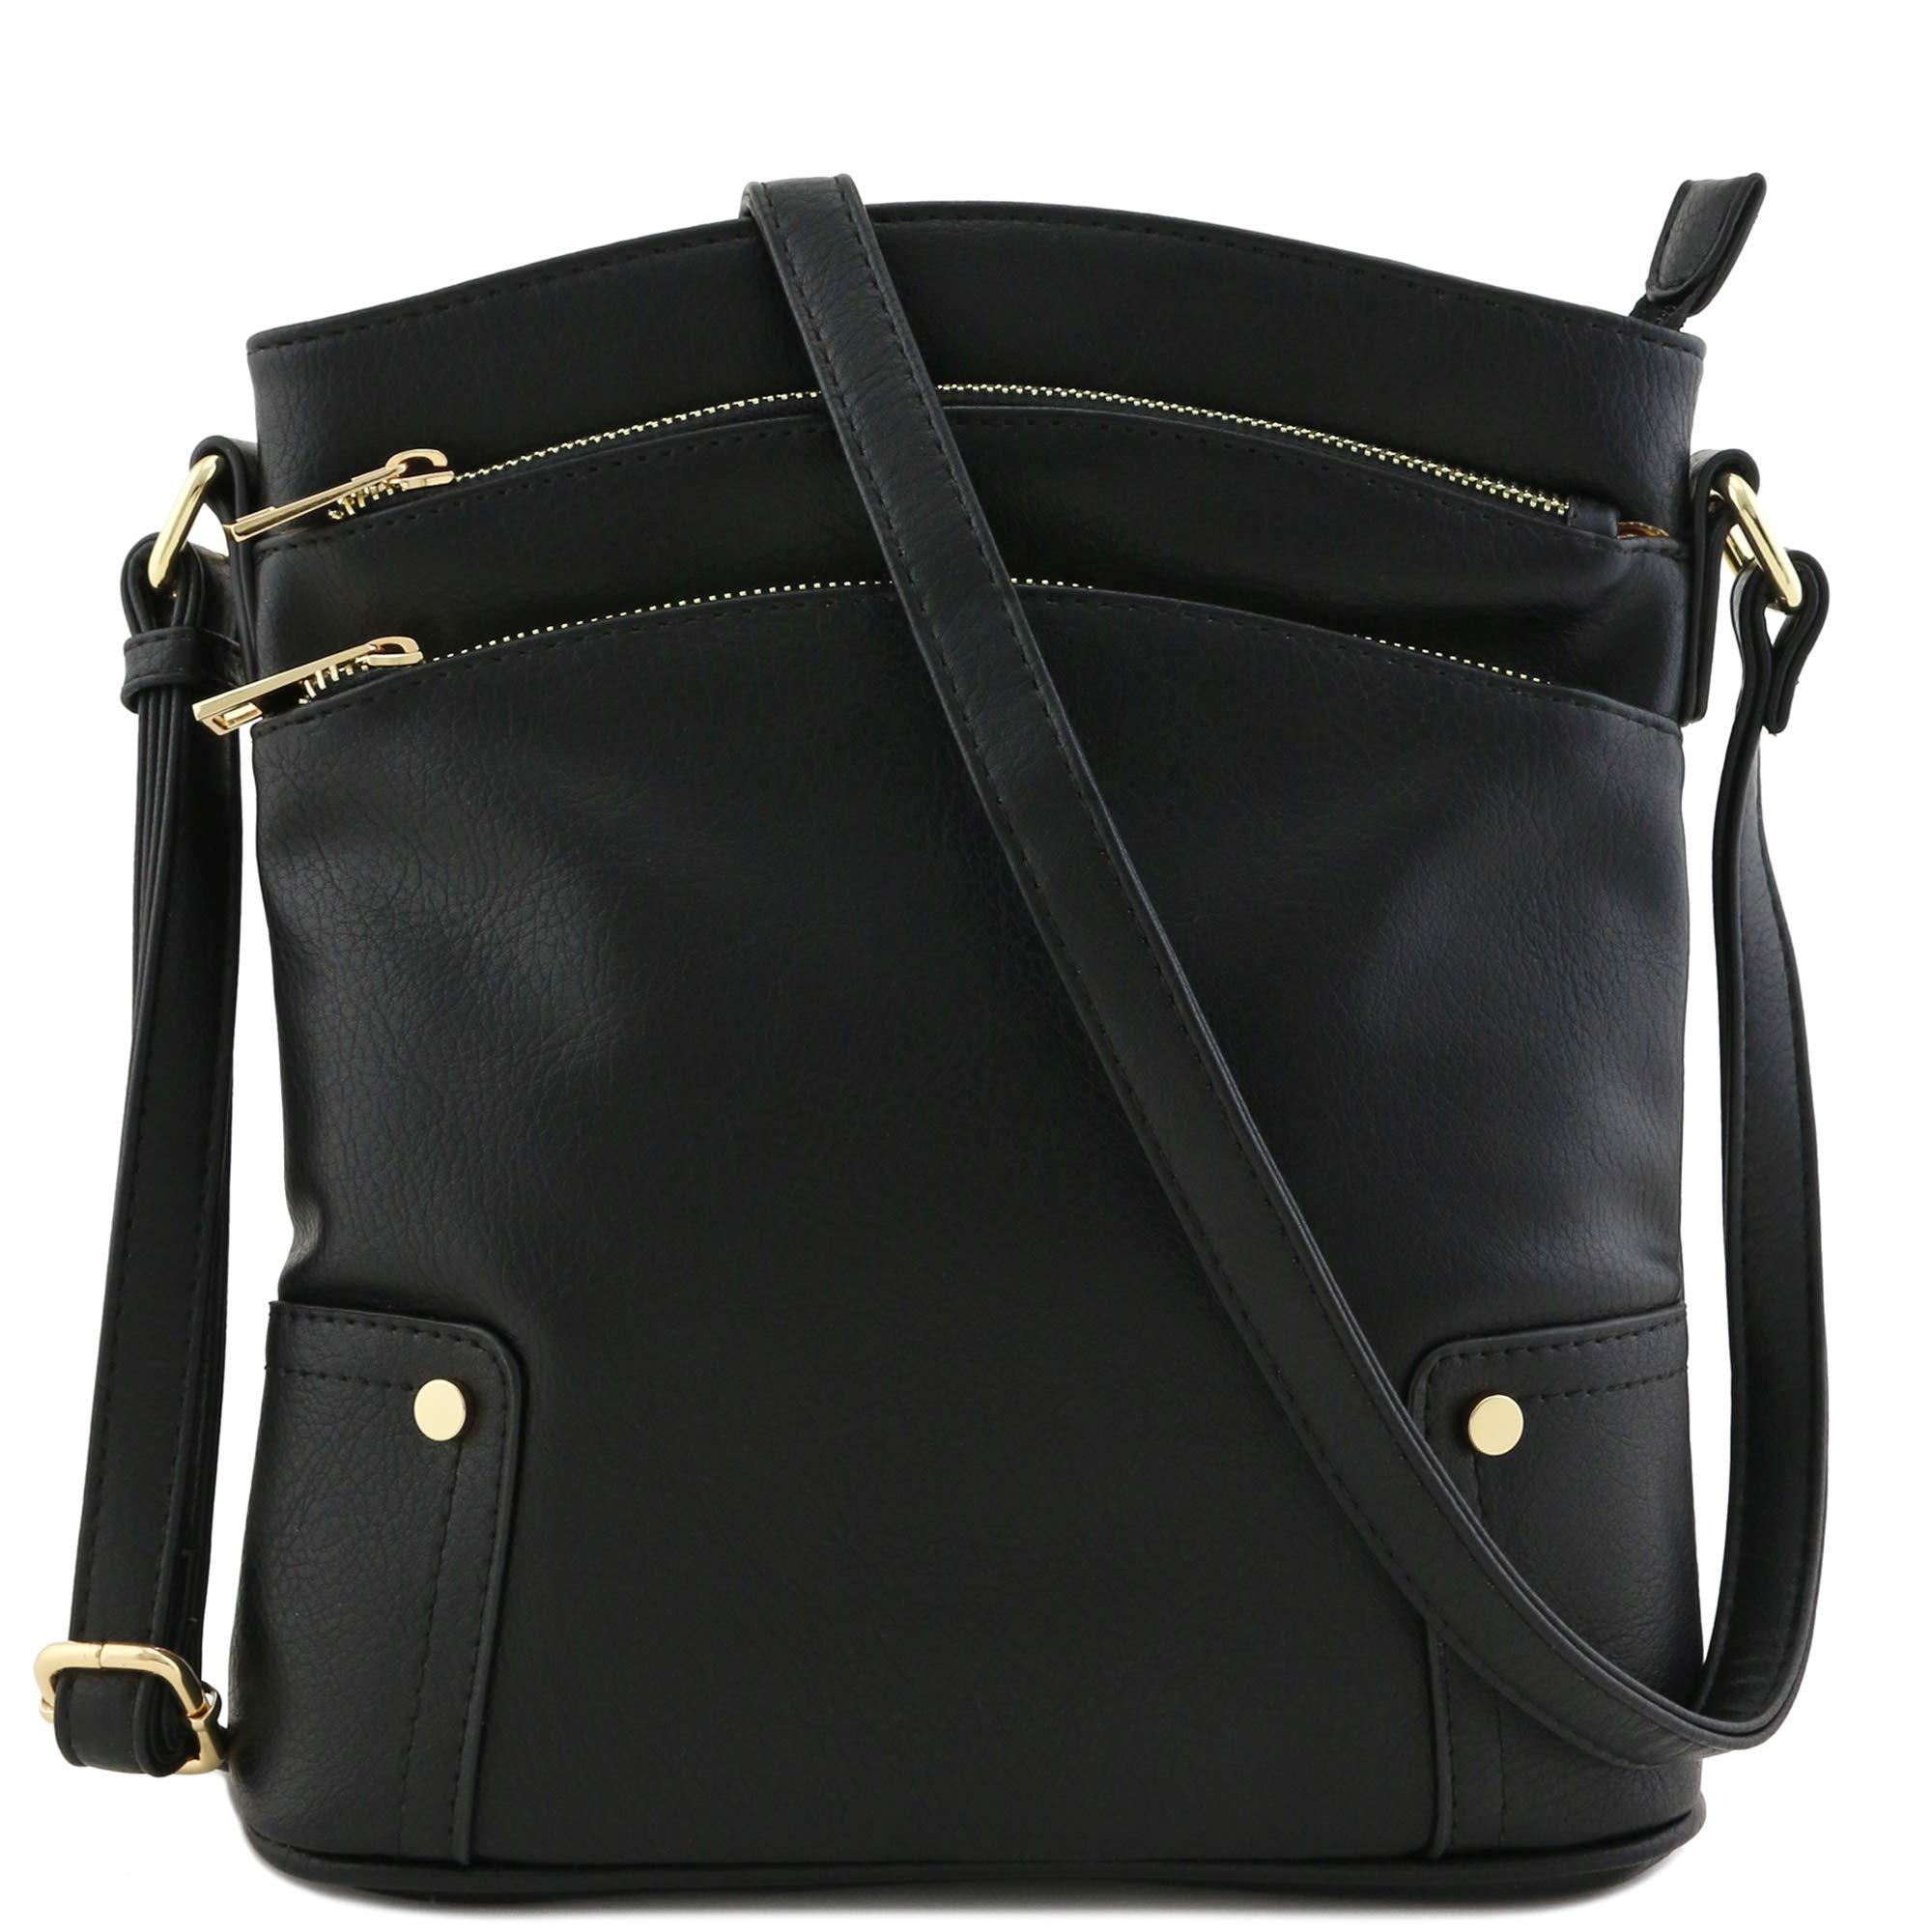 Triple Zip Pocket Large Crossbody Bag Black by Alyssa